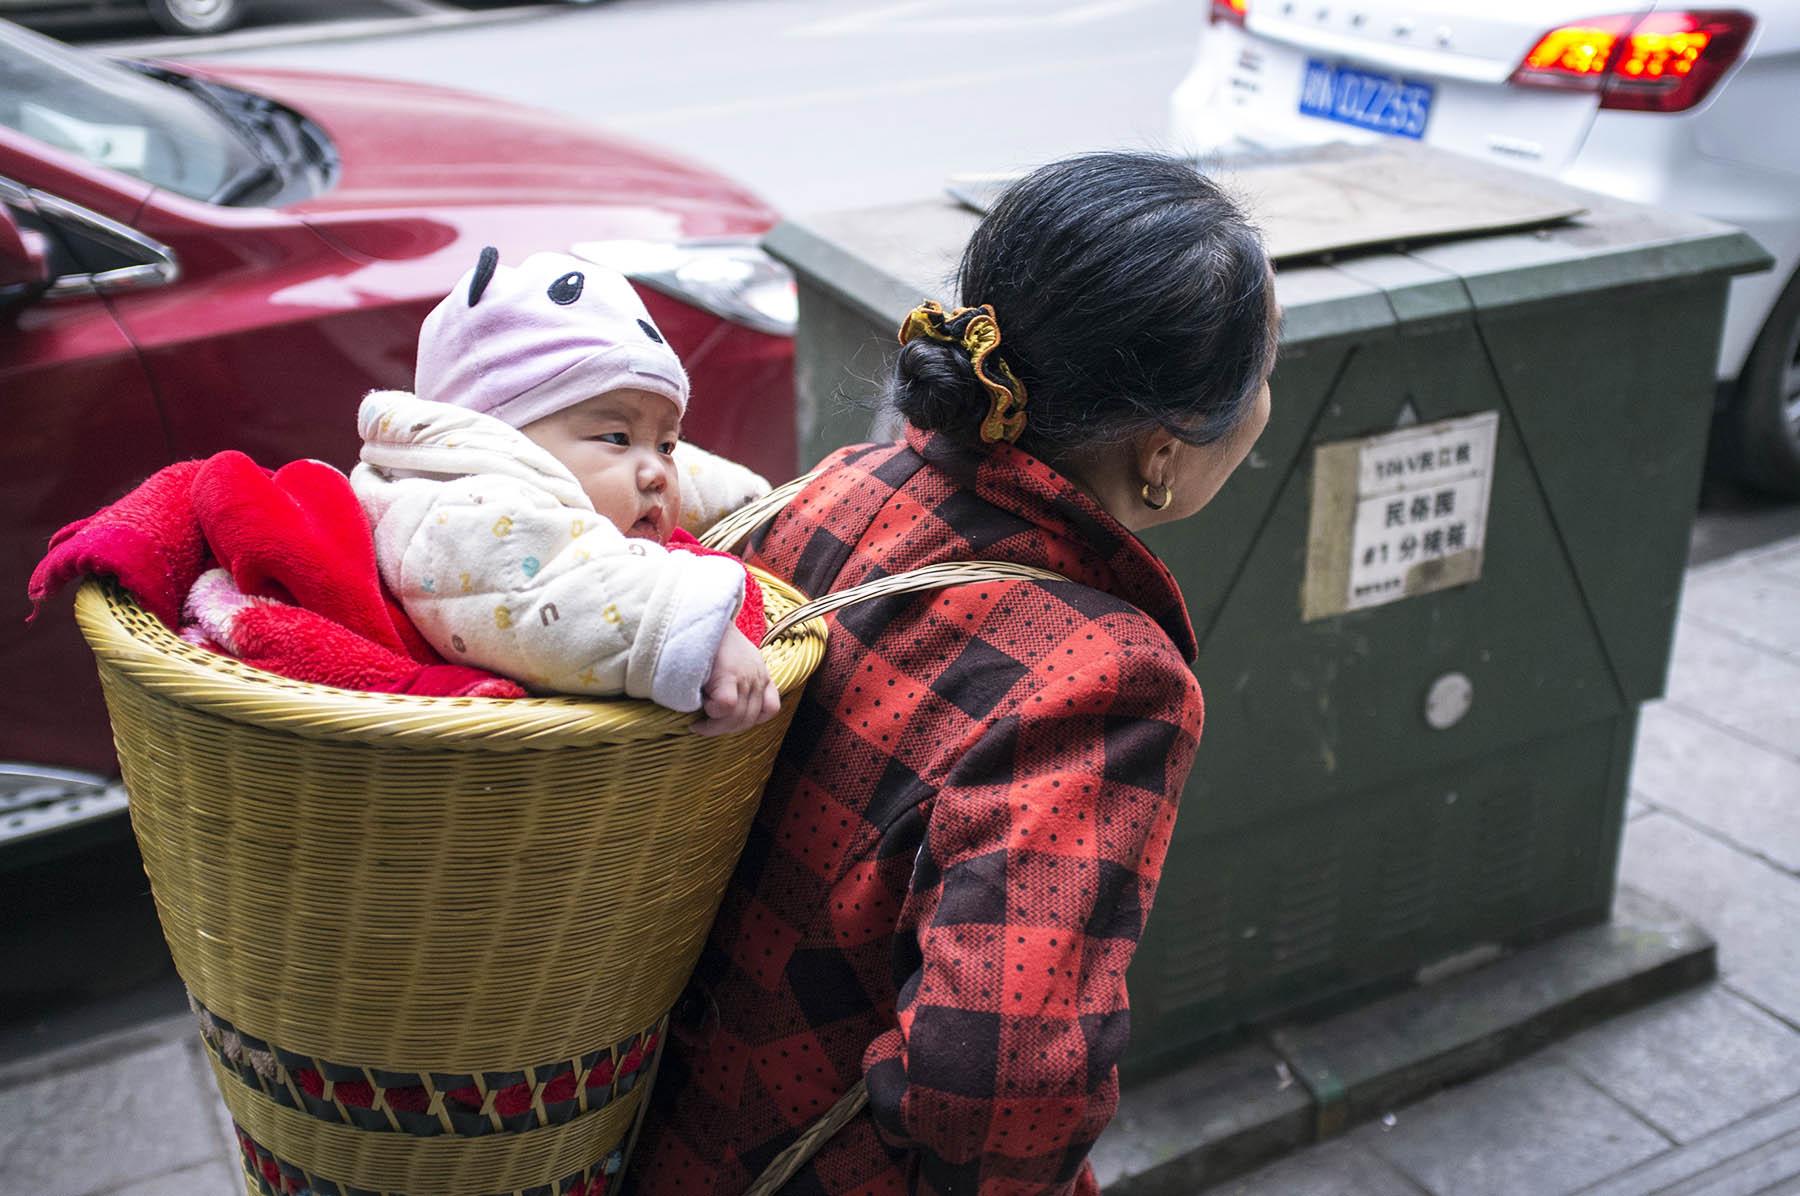 Grandma is carrying her grandson.